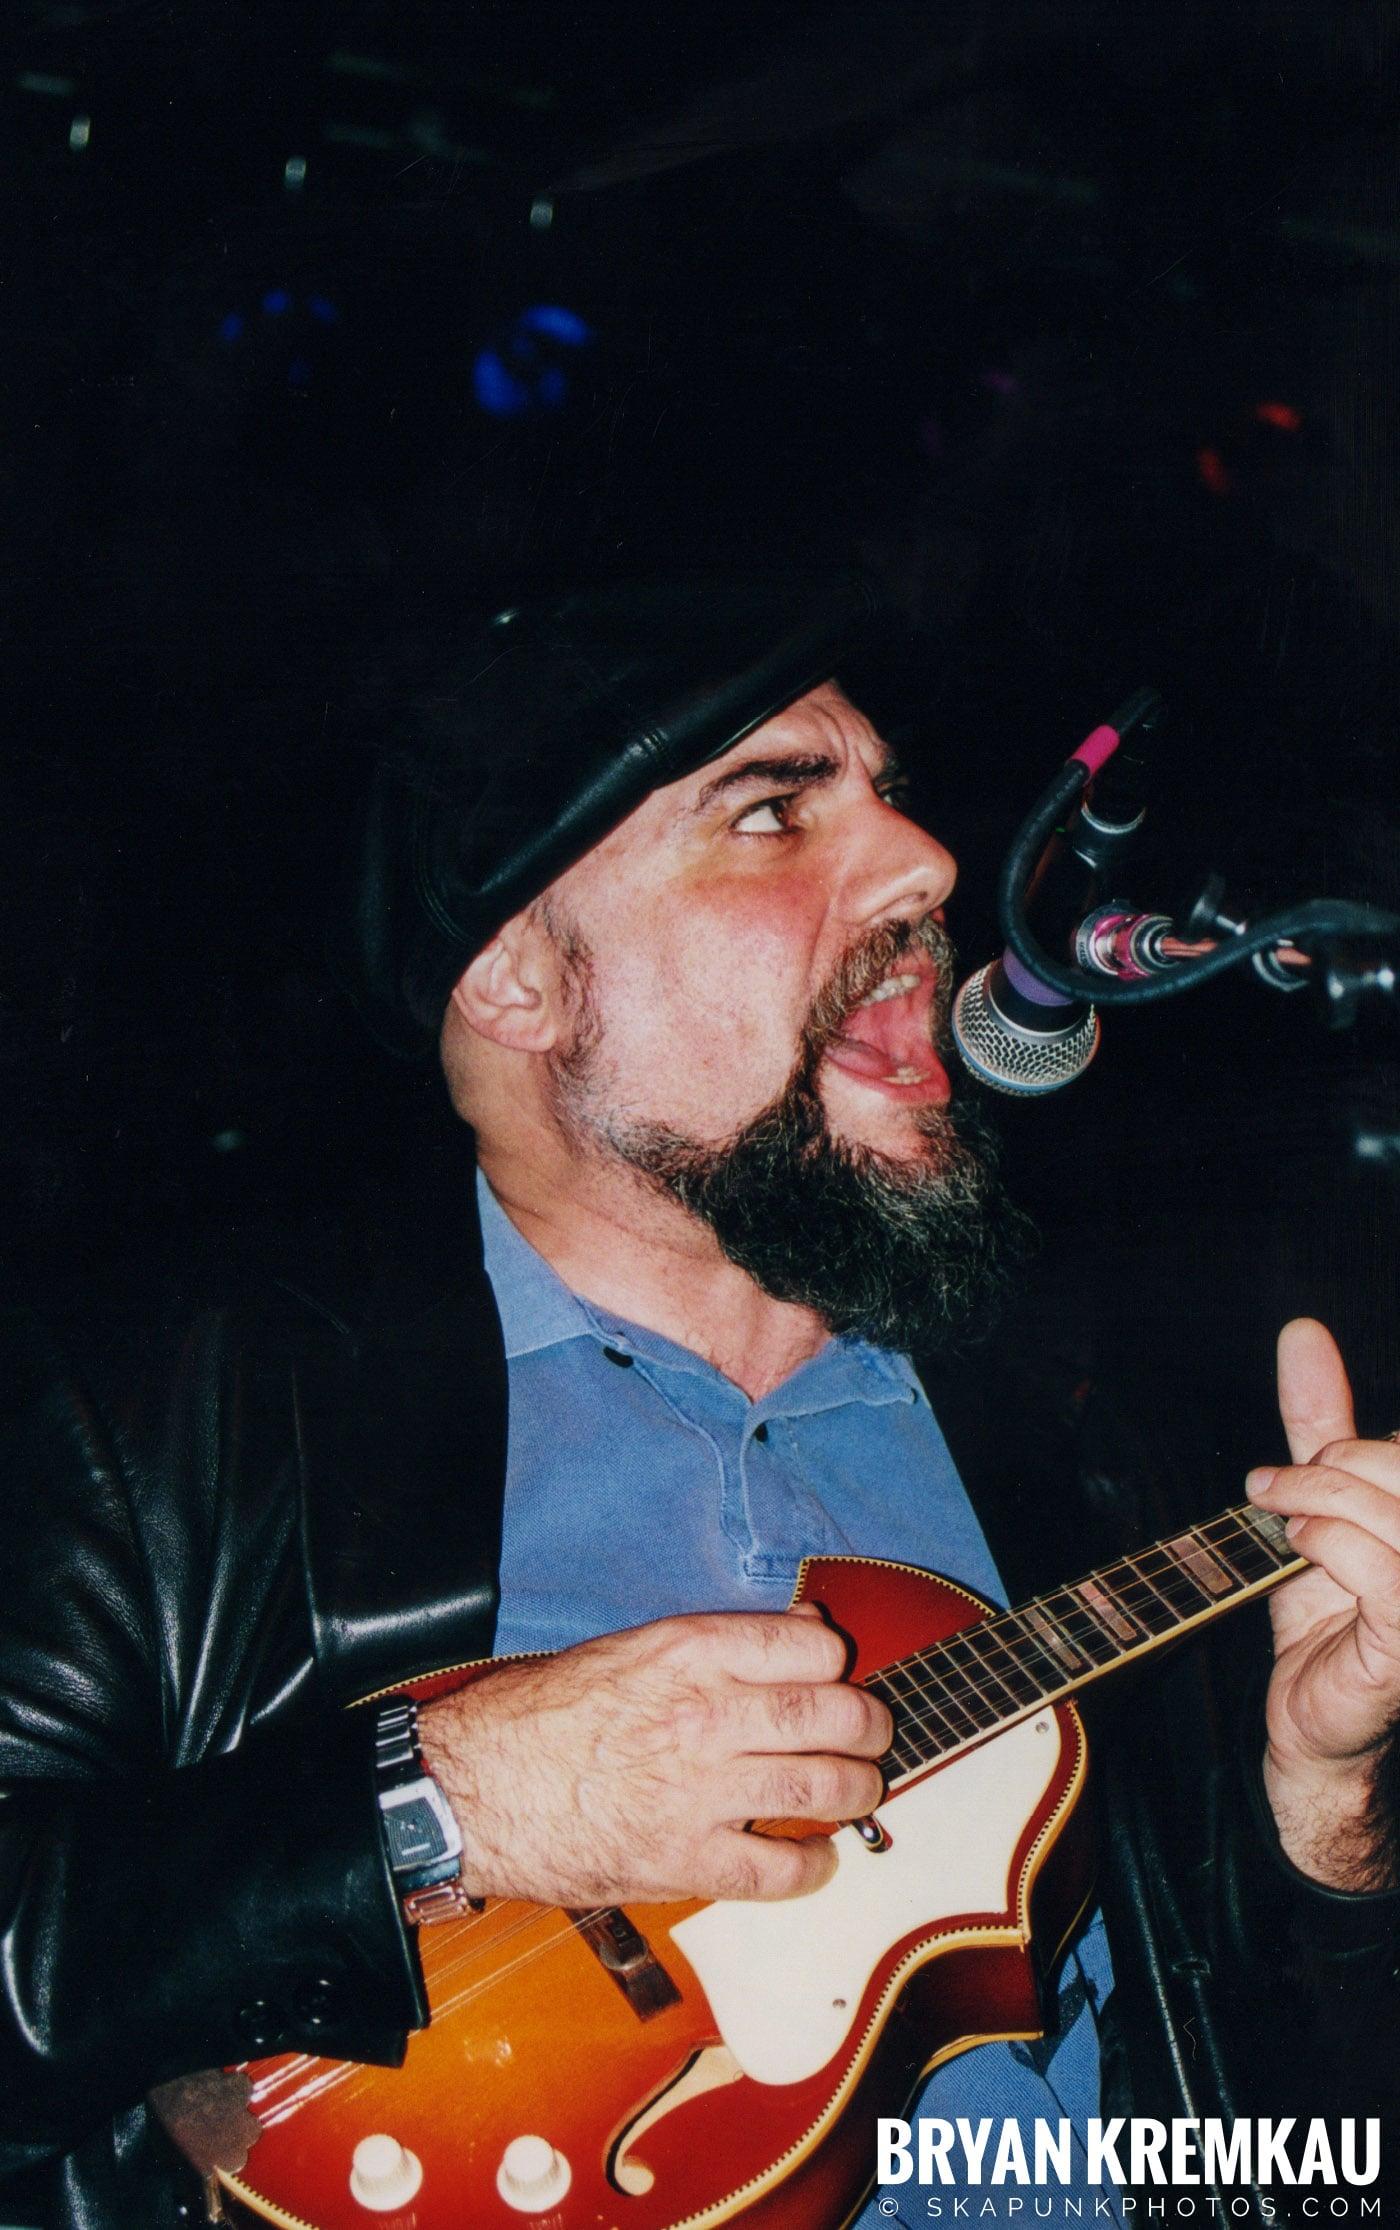 Willie Nile @ Irving Plaza, NYC - 10.4.04 (2)